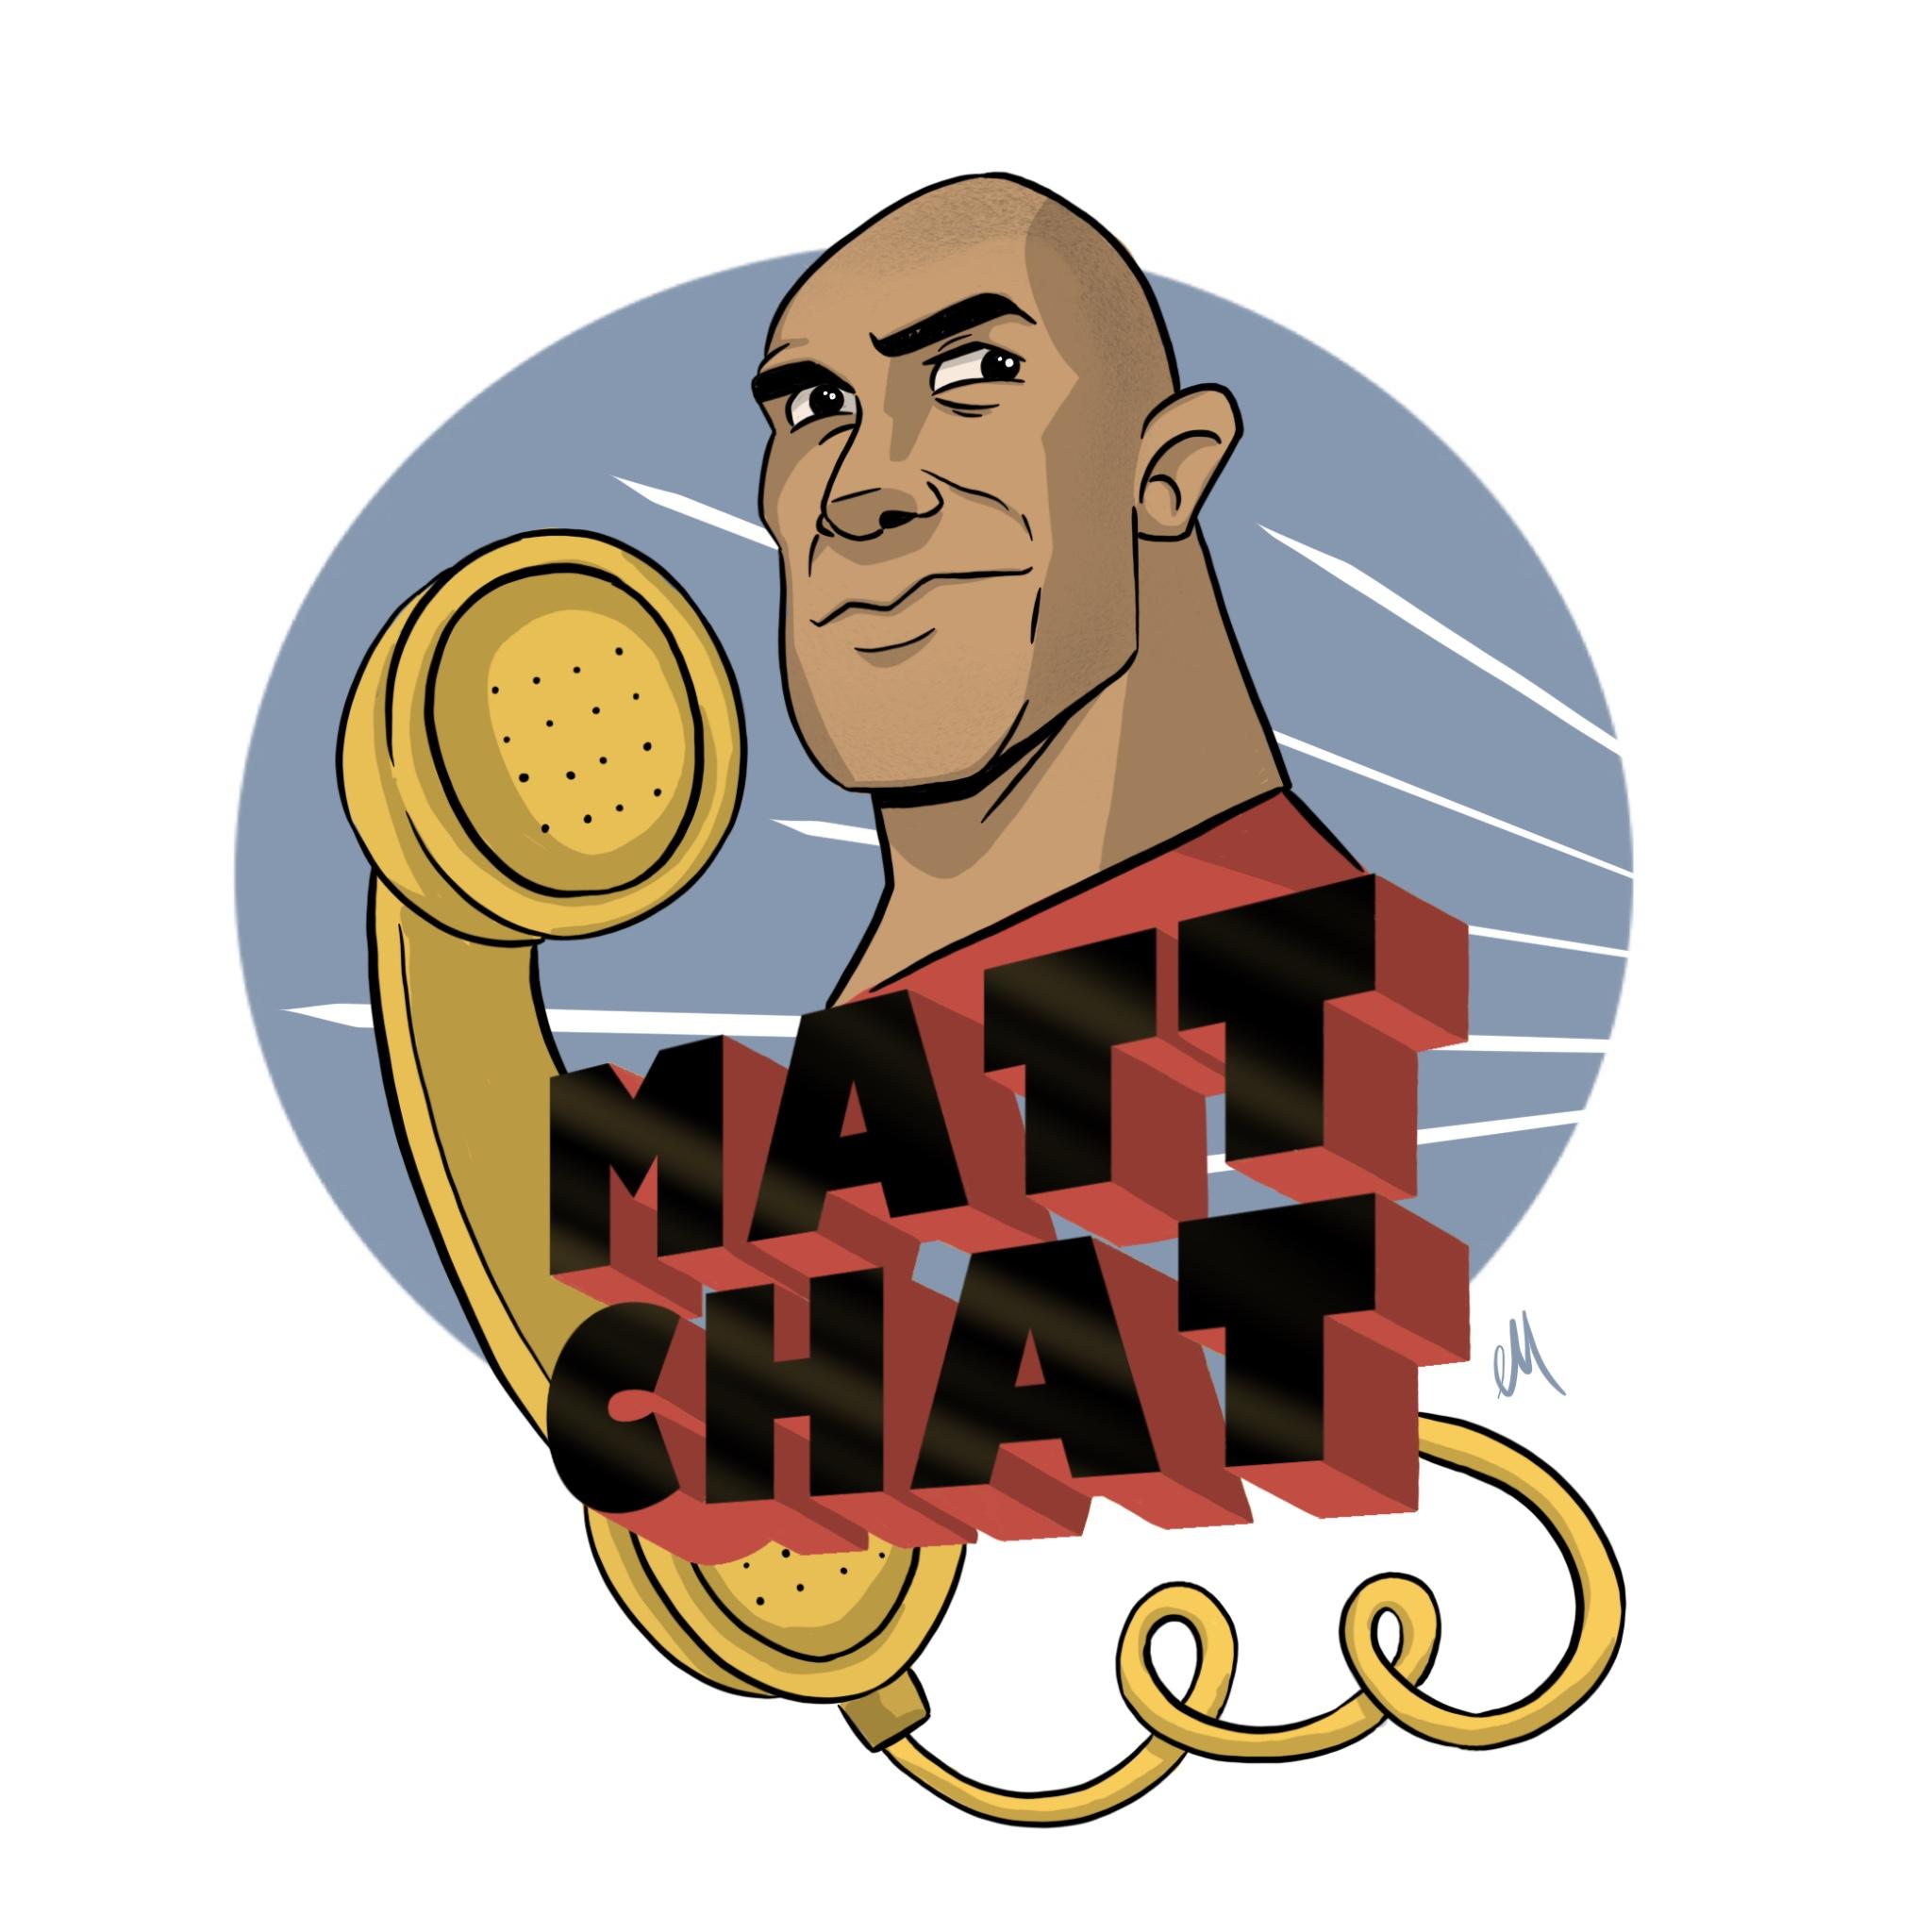 Matt Chat - commission